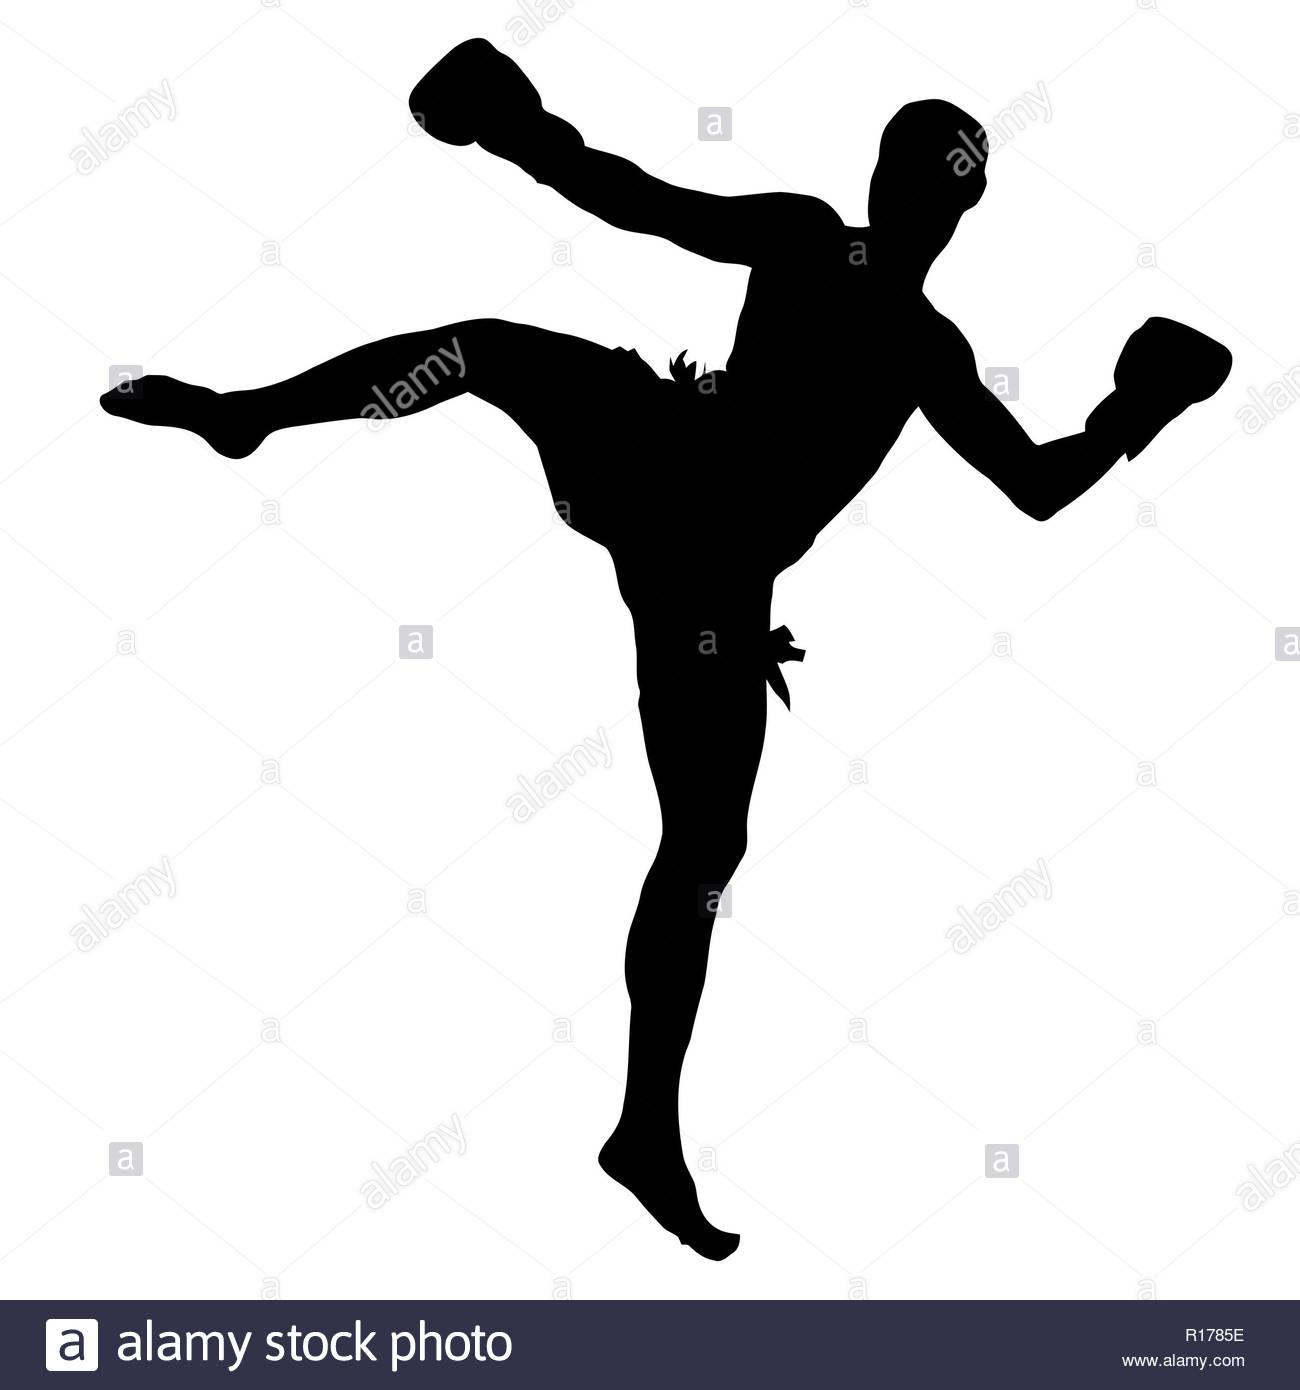 muay thai kickboxing combat sport silhouette illustration - Stock Image